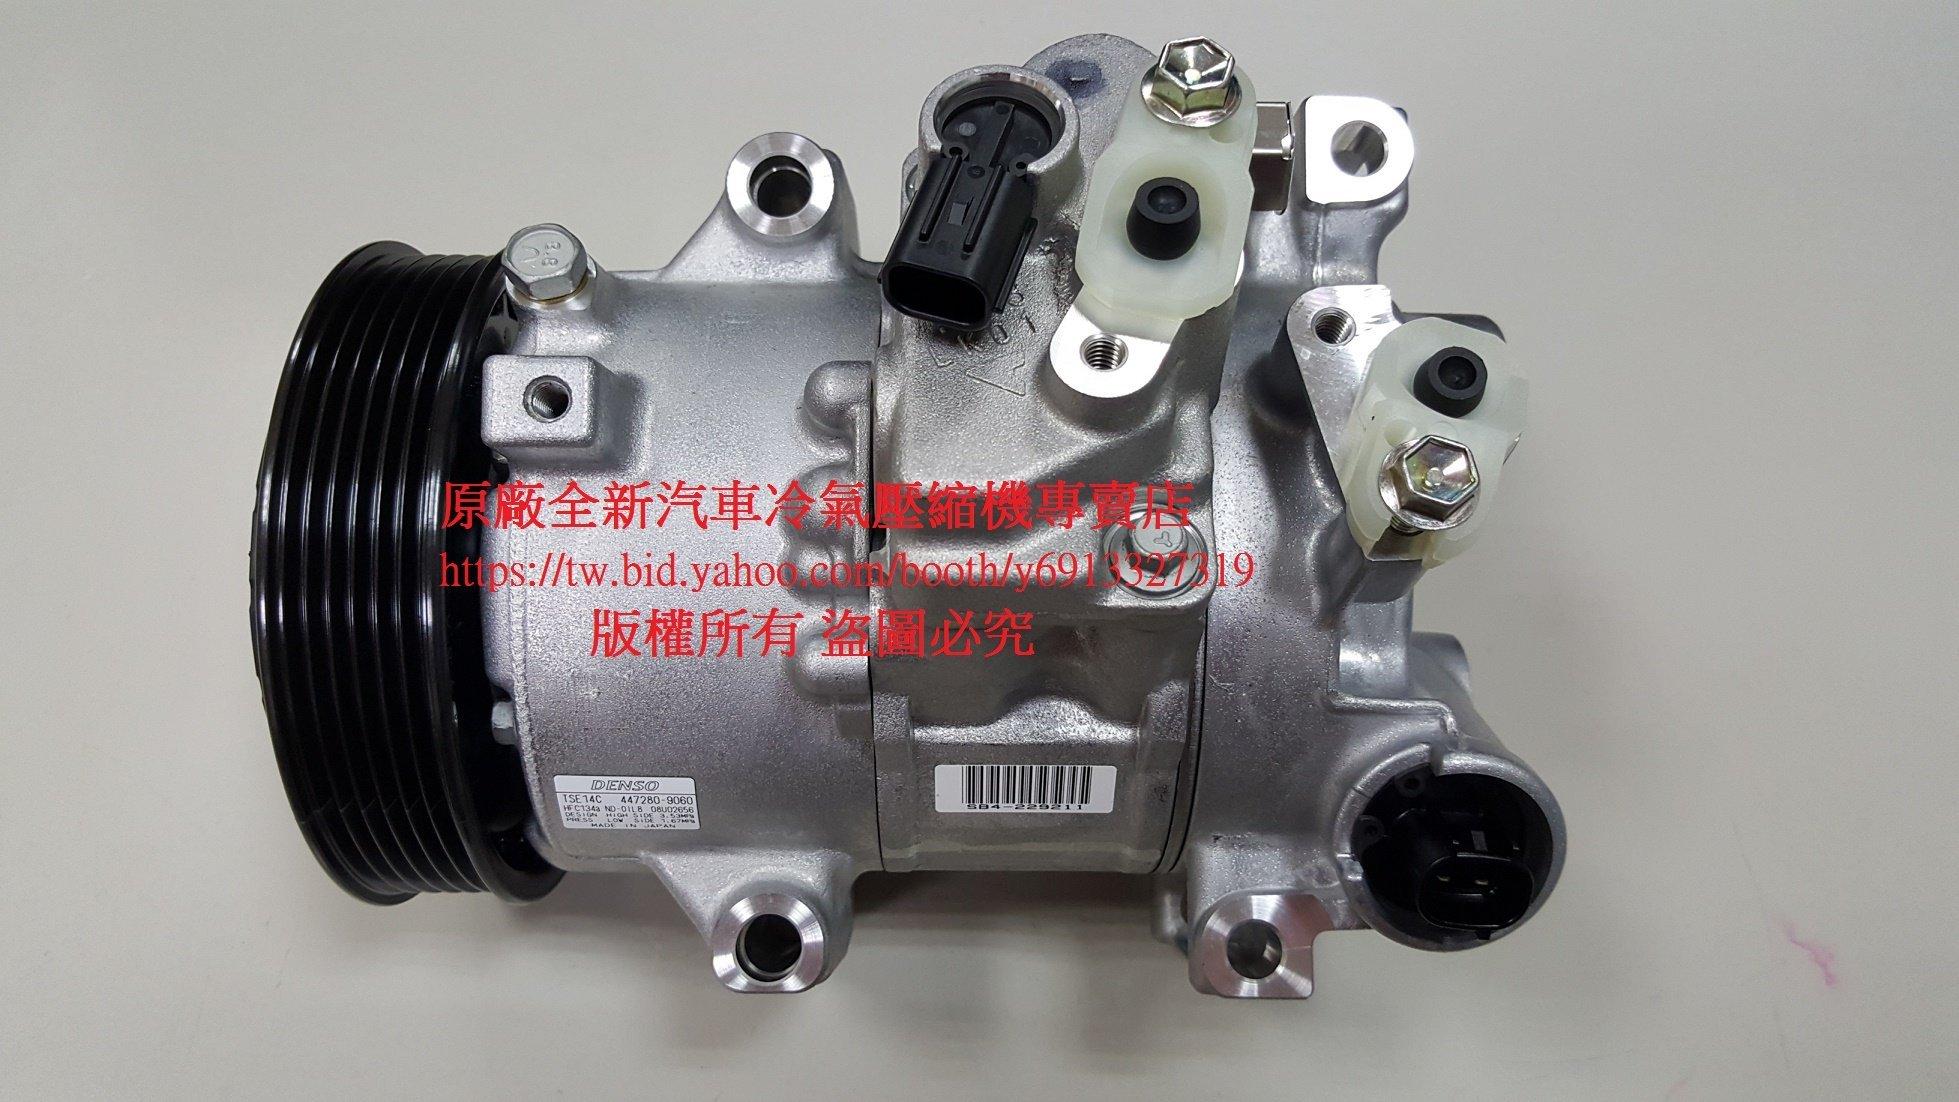 TOYOTA WISH 2.0L (第2代) / ALTIS 1.8L (第二代小改款) 原廠全新汽車冷氣壓縮機